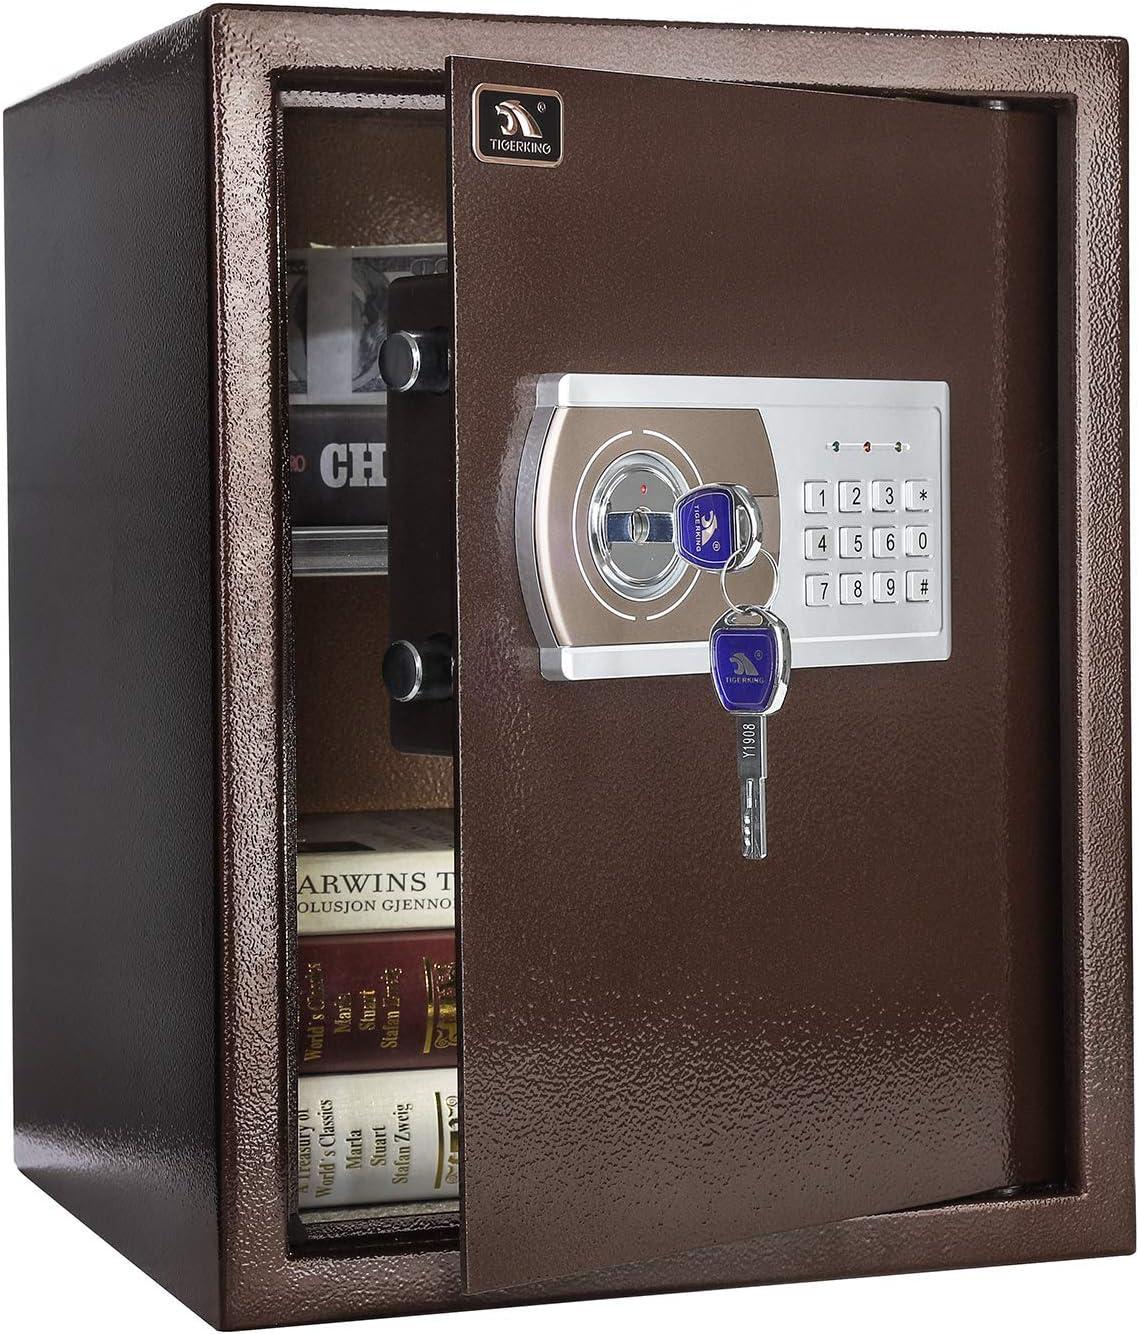 TIGERKING Security Digital Lock Box Safe Home Keypad Safe - 1.8 Cubic Feet